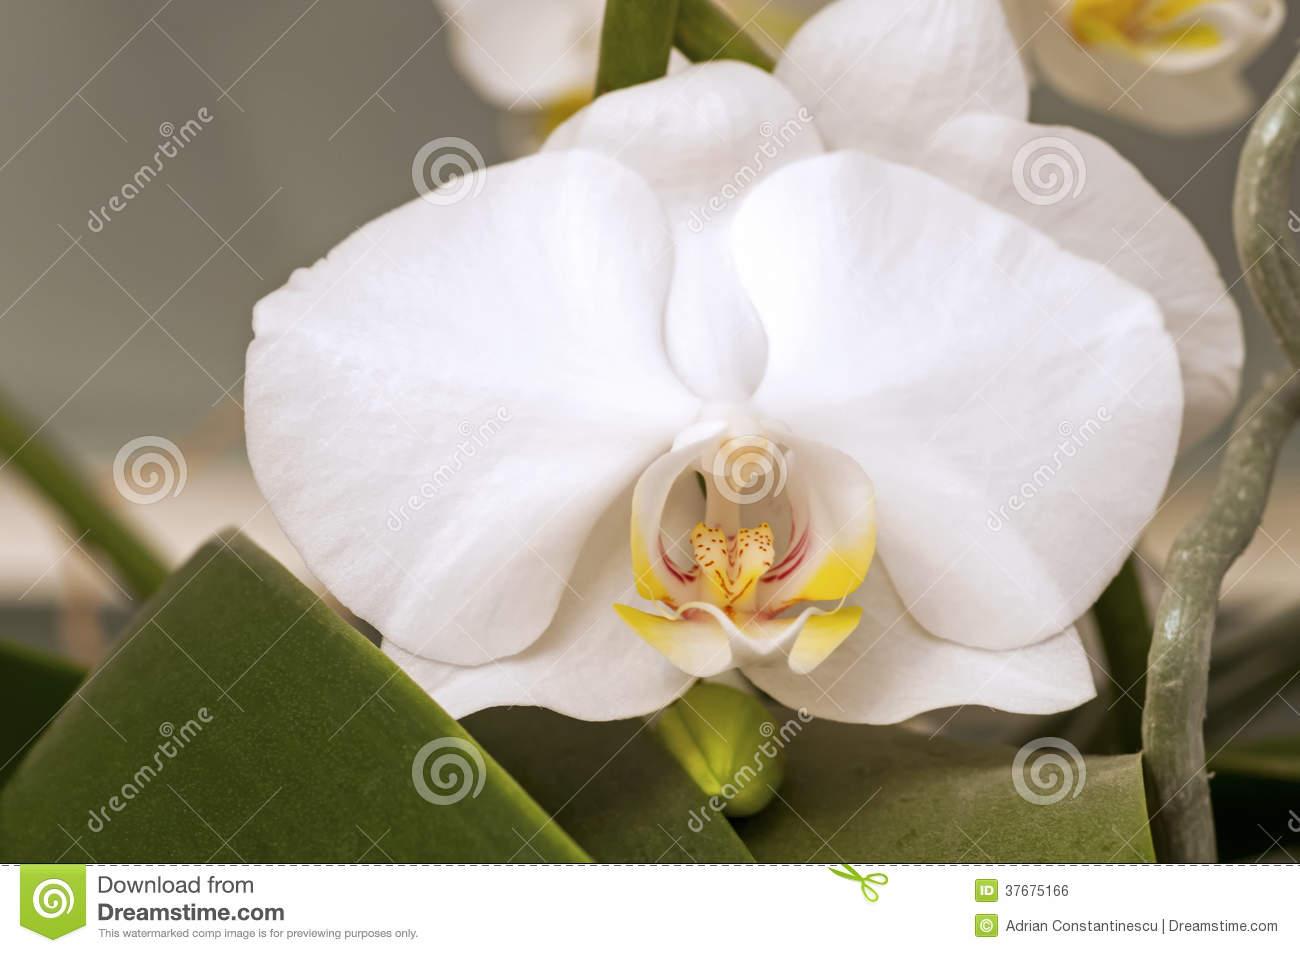 White Doritaenopsis Orchid Flower Royalty Free Stock Image.